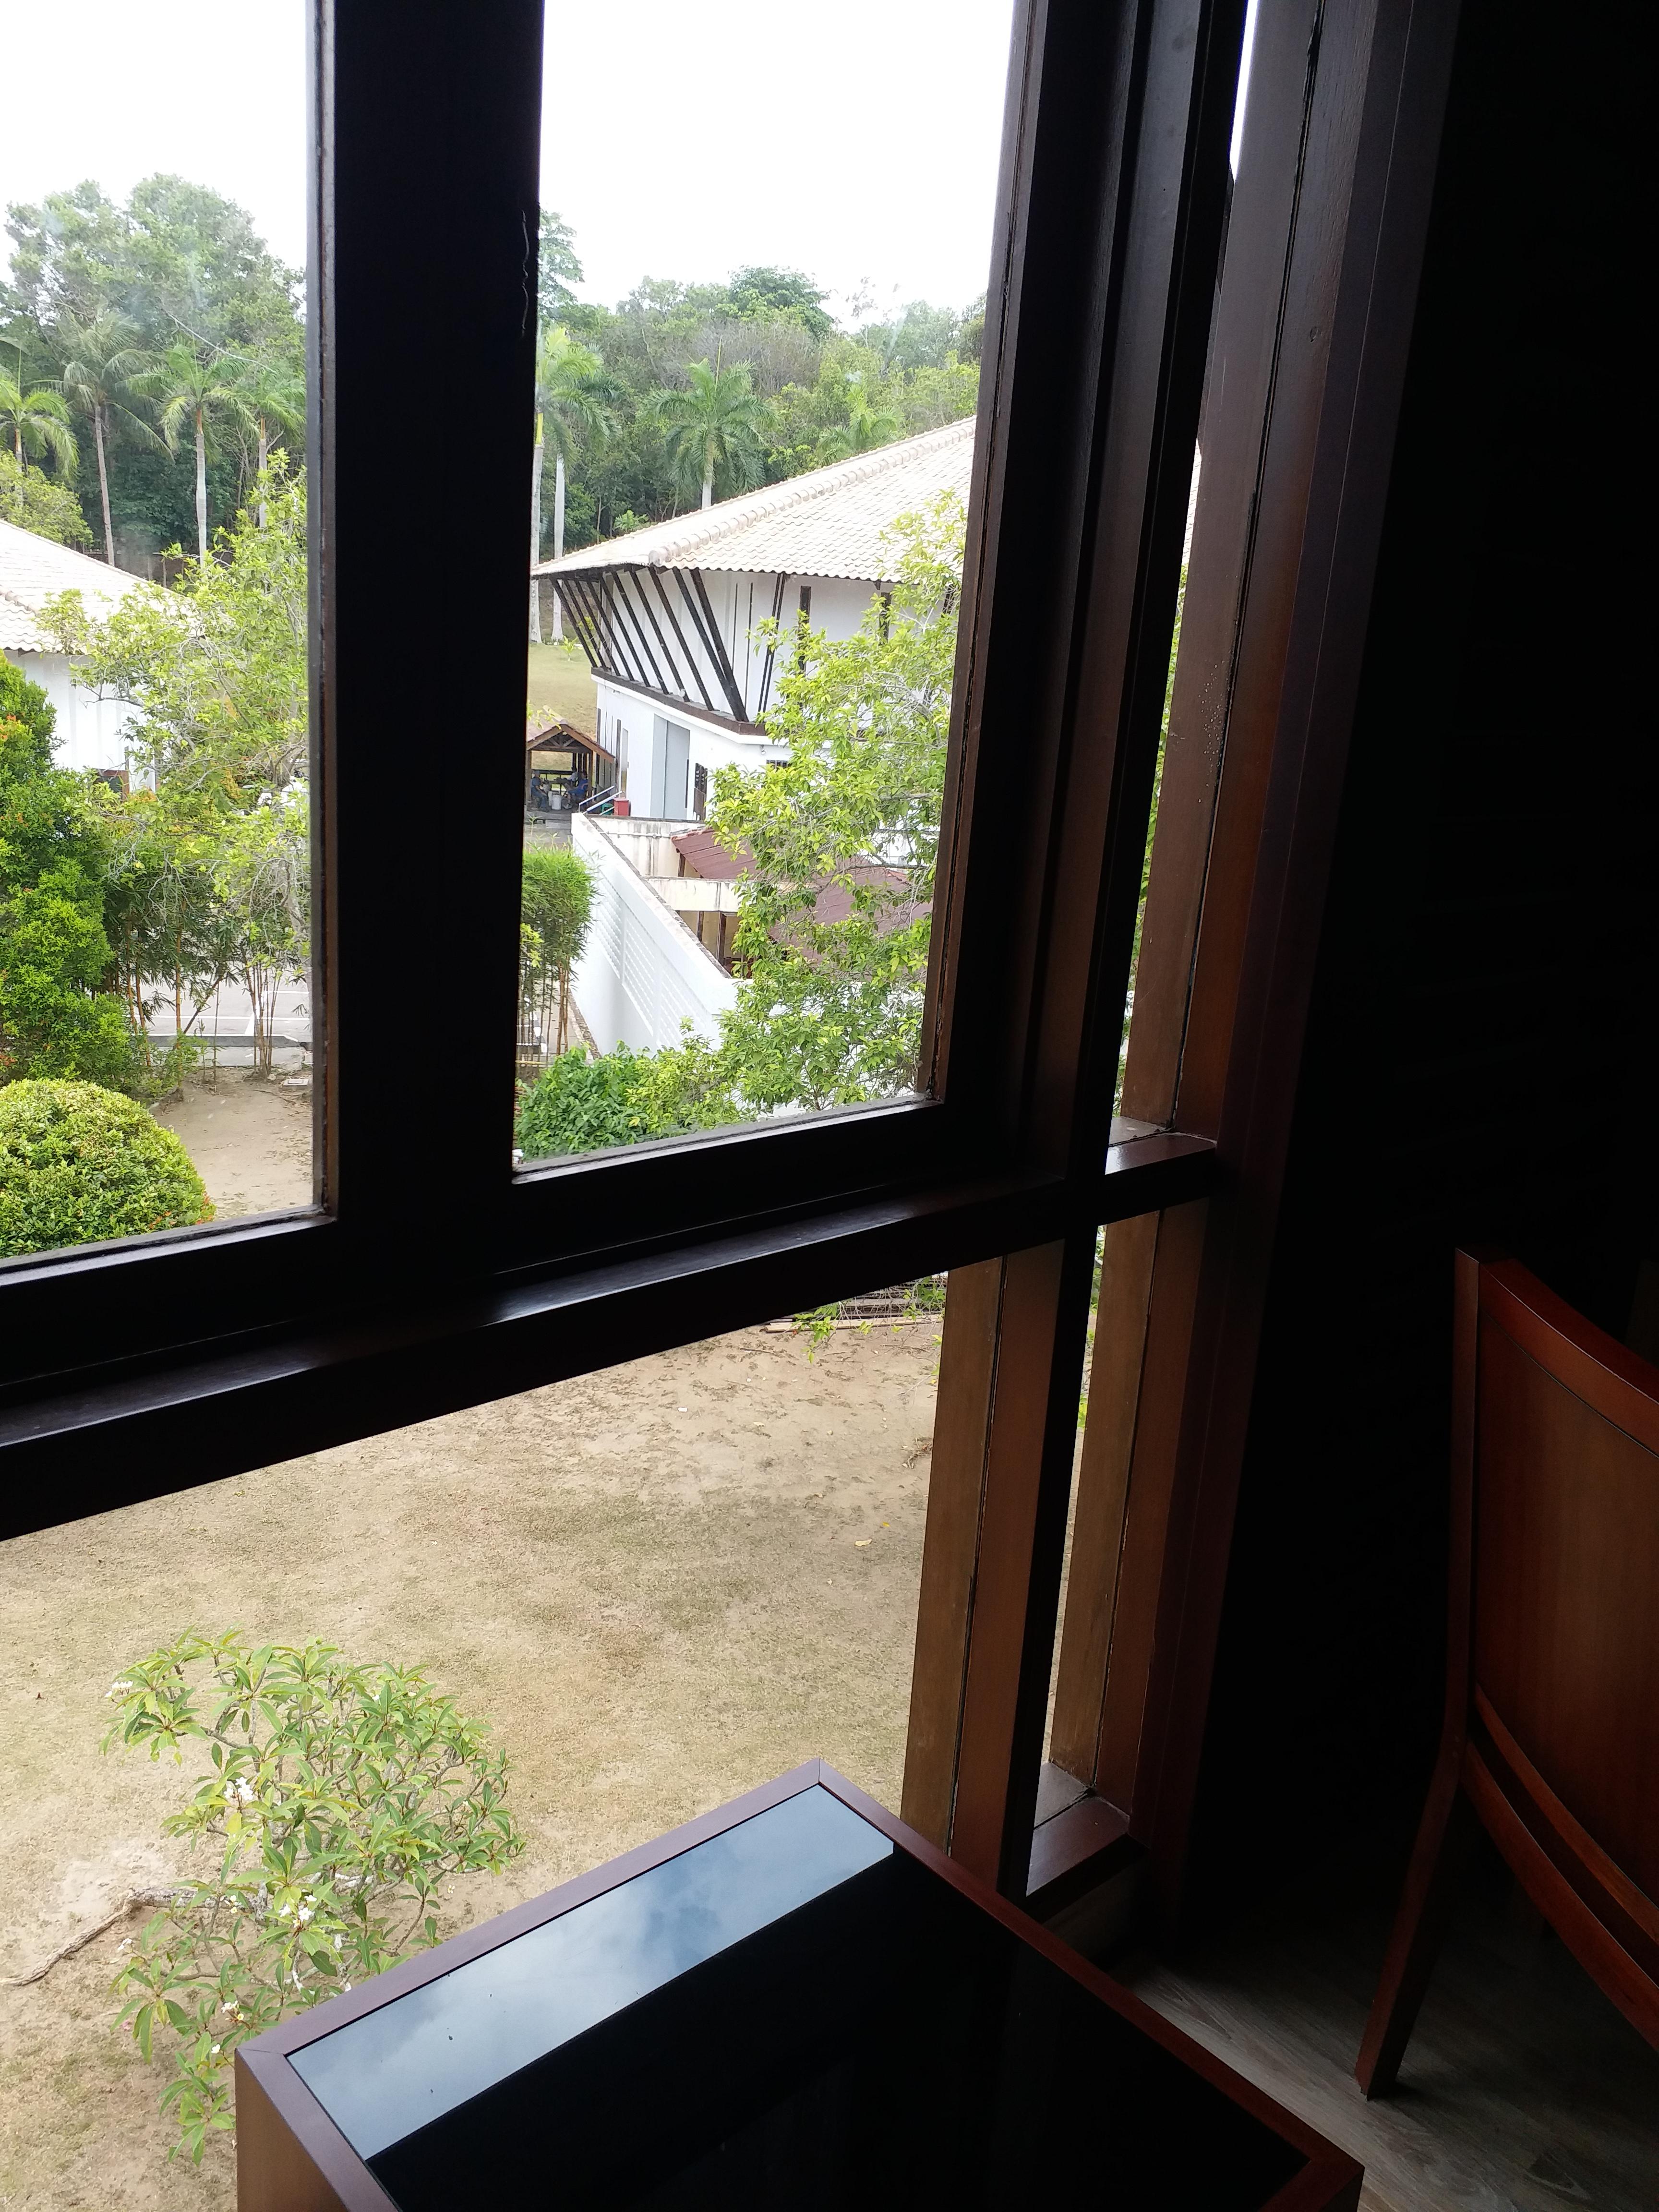 outside view, nirwana garddens,bintan.jpg